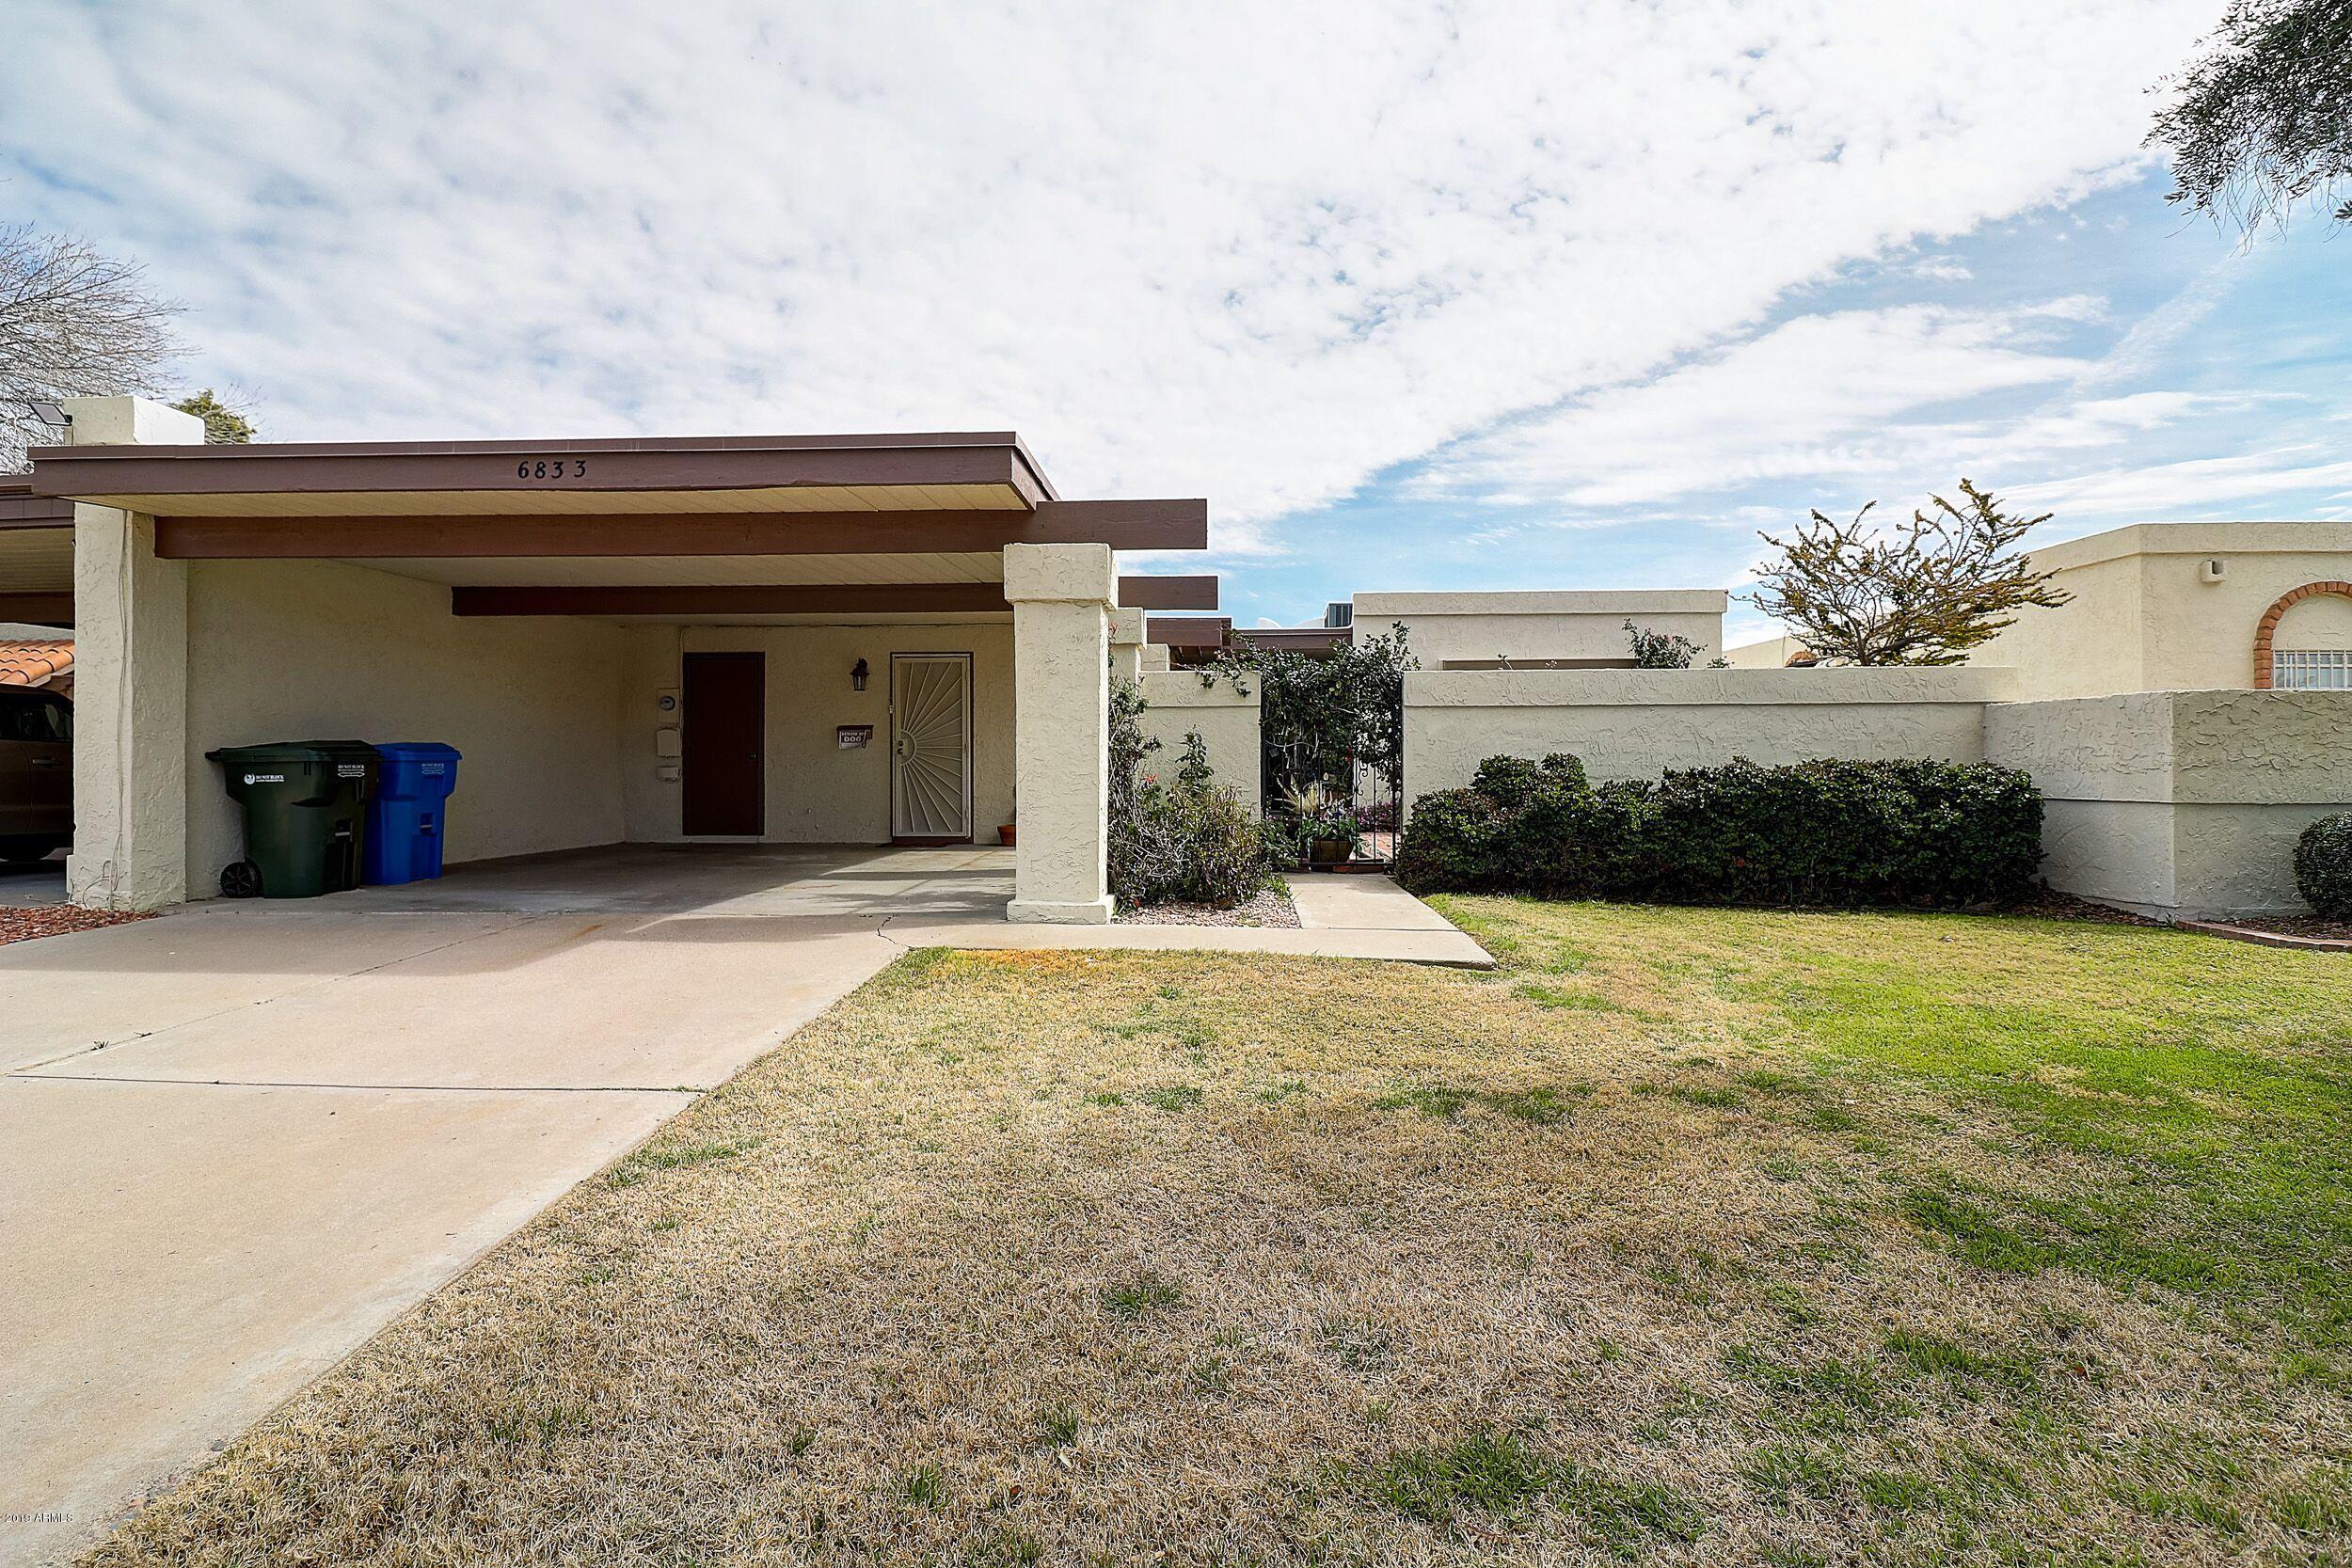 Photo of 6833 N 29TH Avenue, Phoenix, AZ 85017